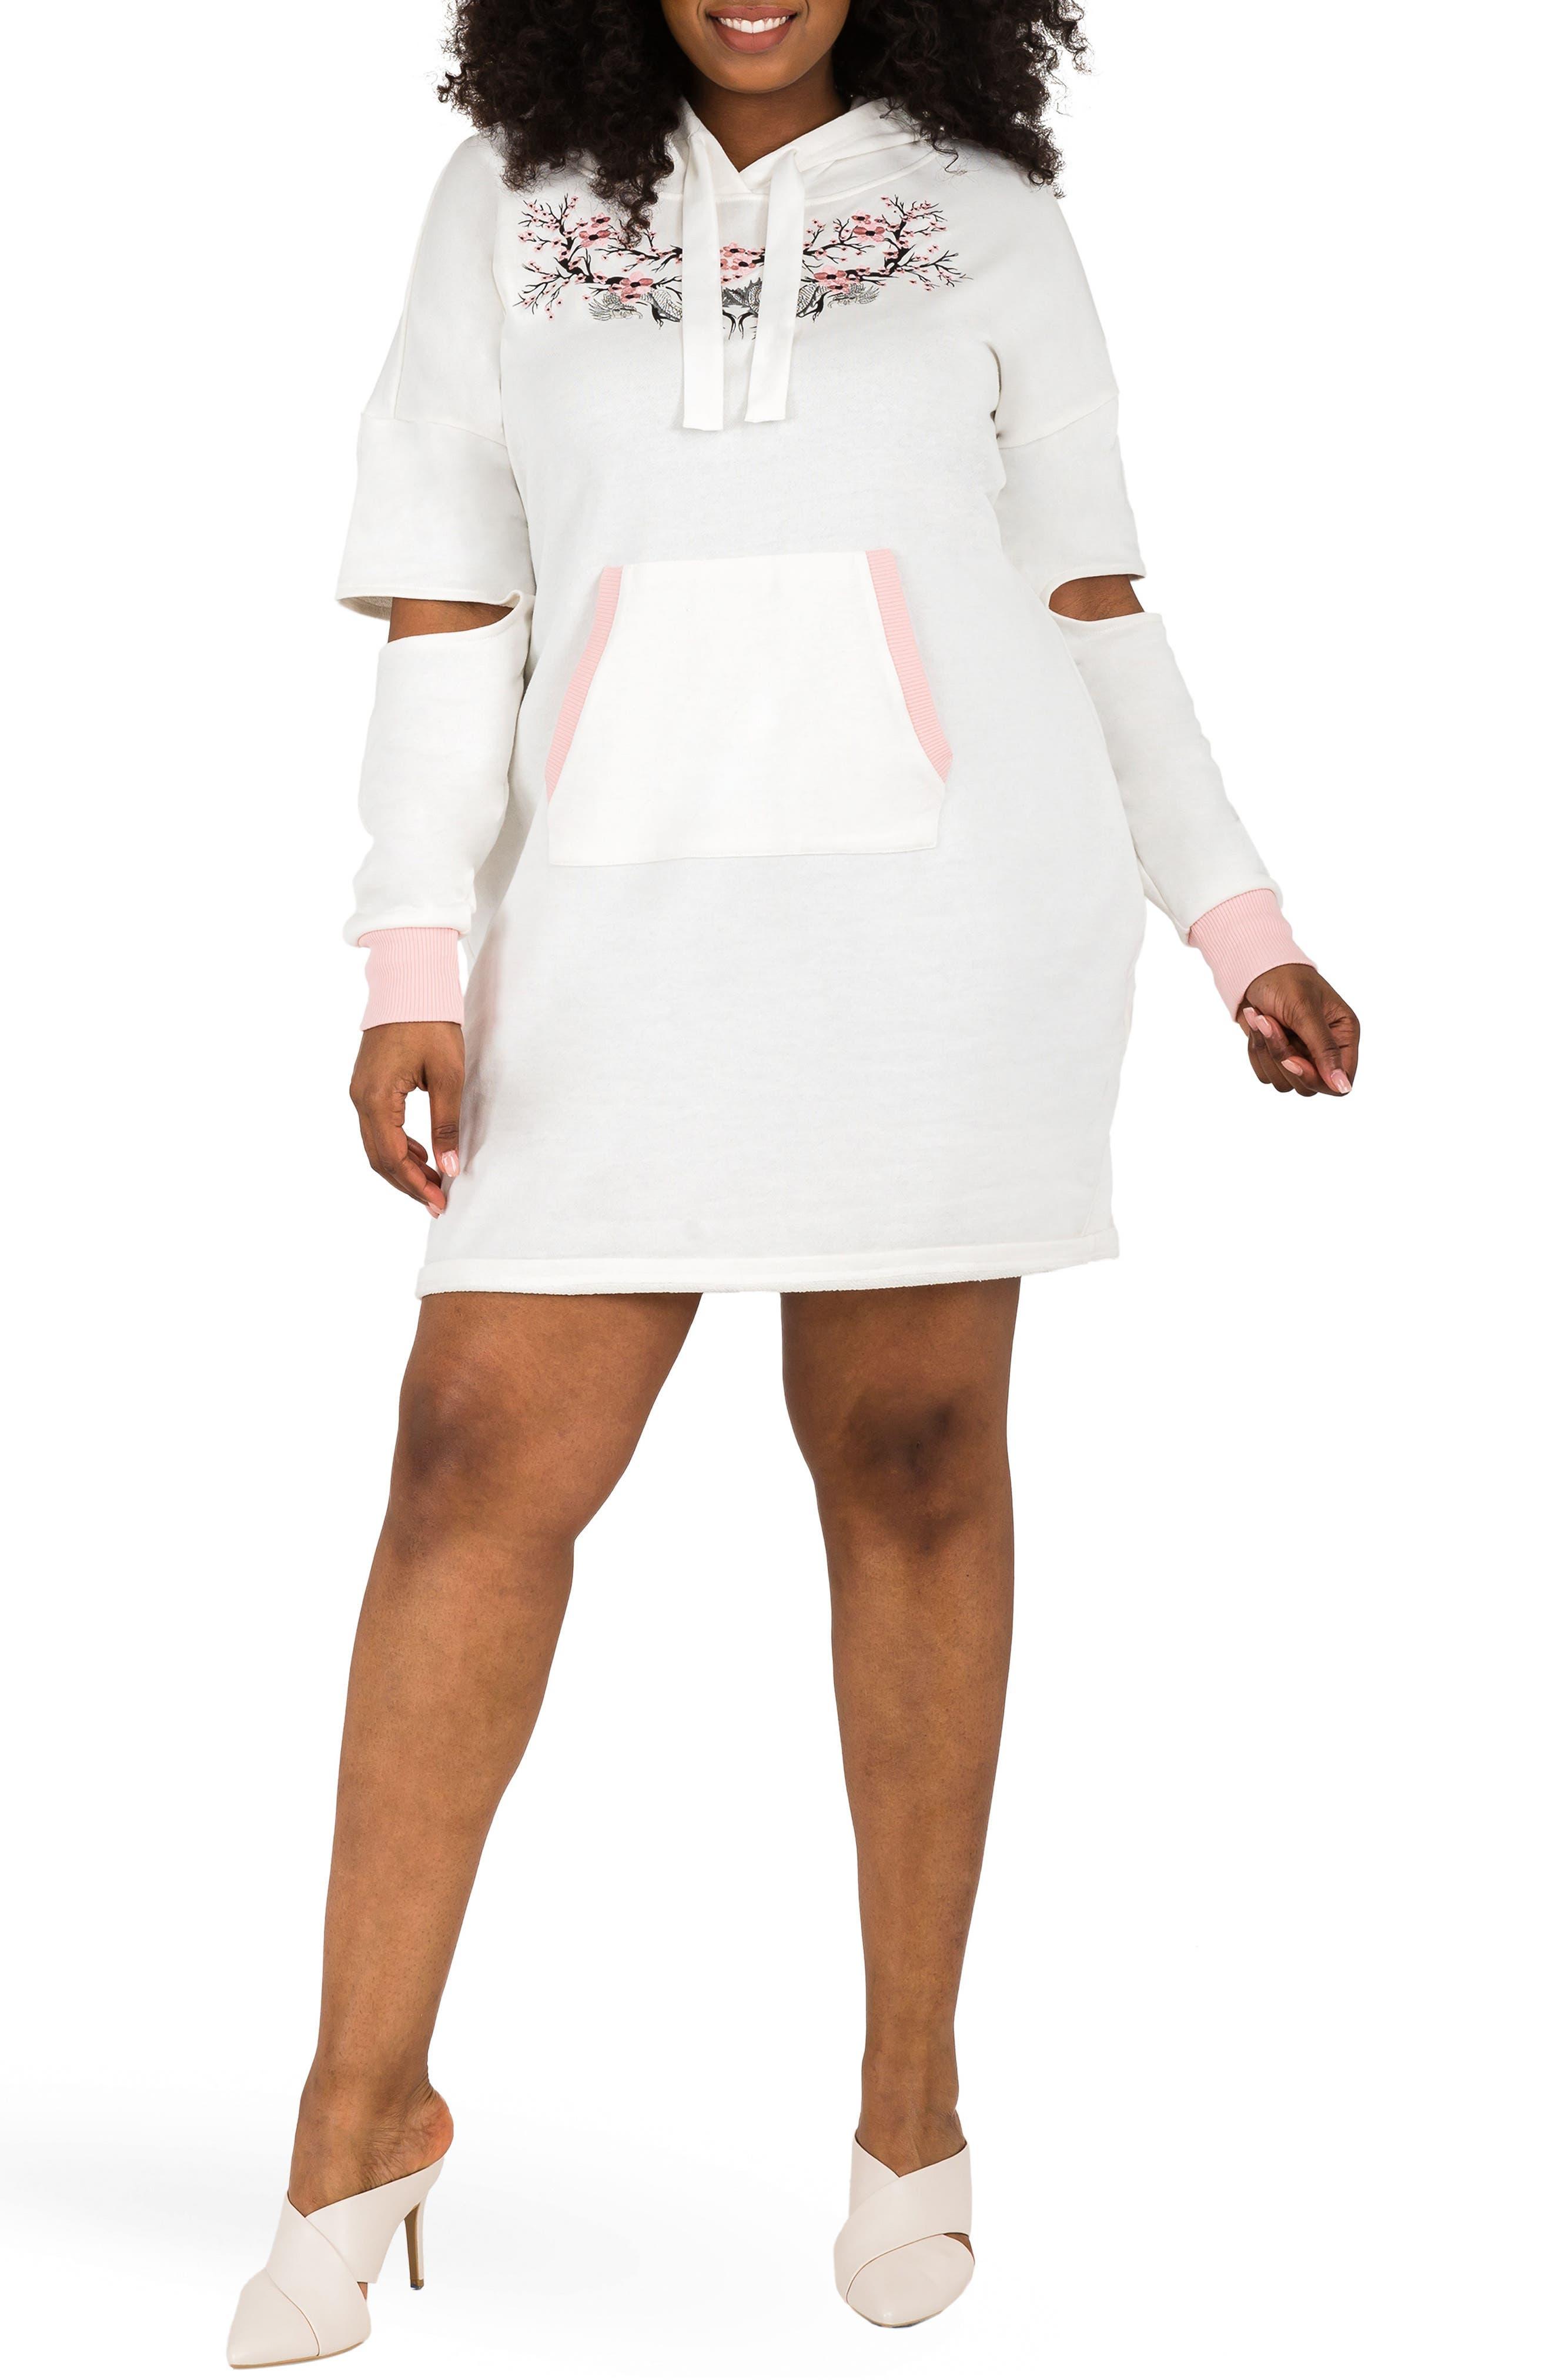 POETIC JUSTICE Cylene Hoodie Dress, Main, color, QUARTZ WHITE